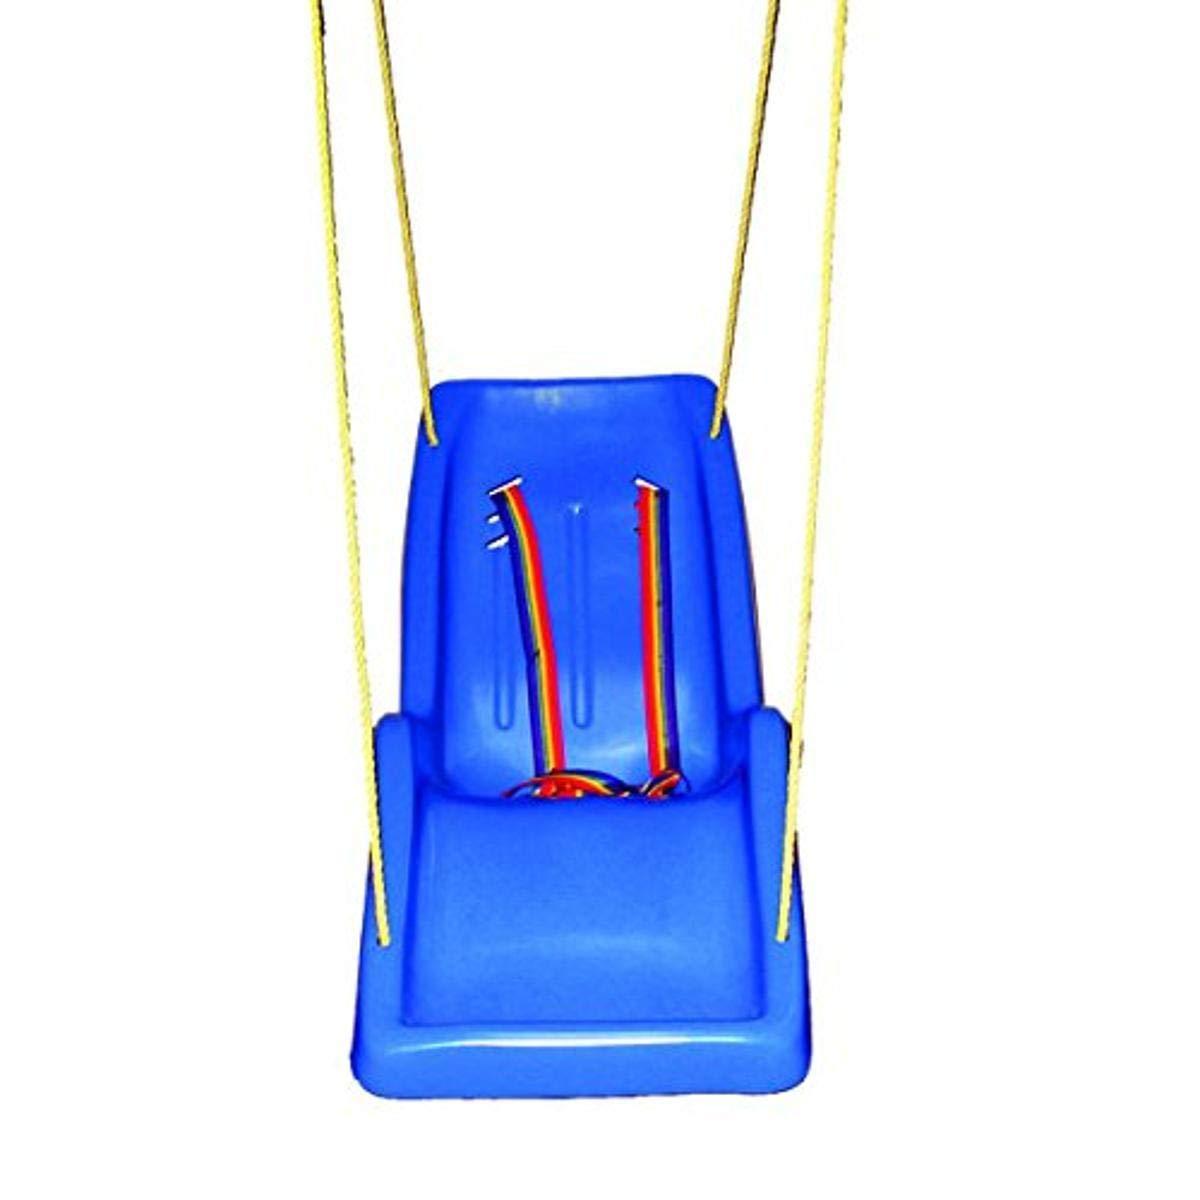 Skillbuilders Full-Body Universal Reclining Swing Seat | Medicaleshop